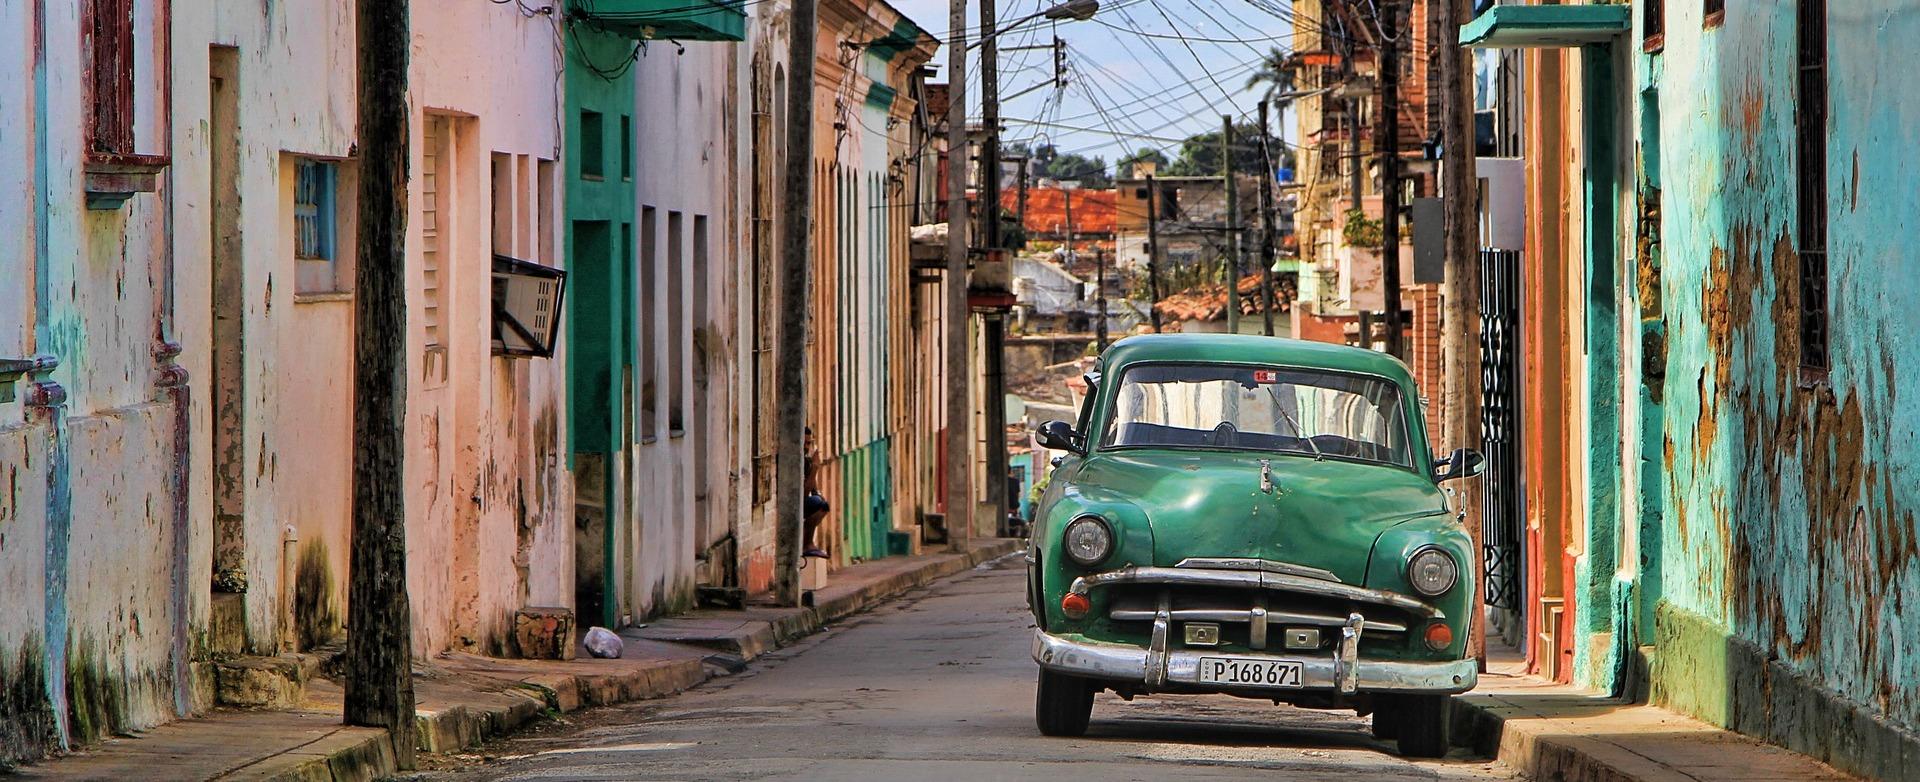 Autotransport Zentralamerika Fahrzeugtransport